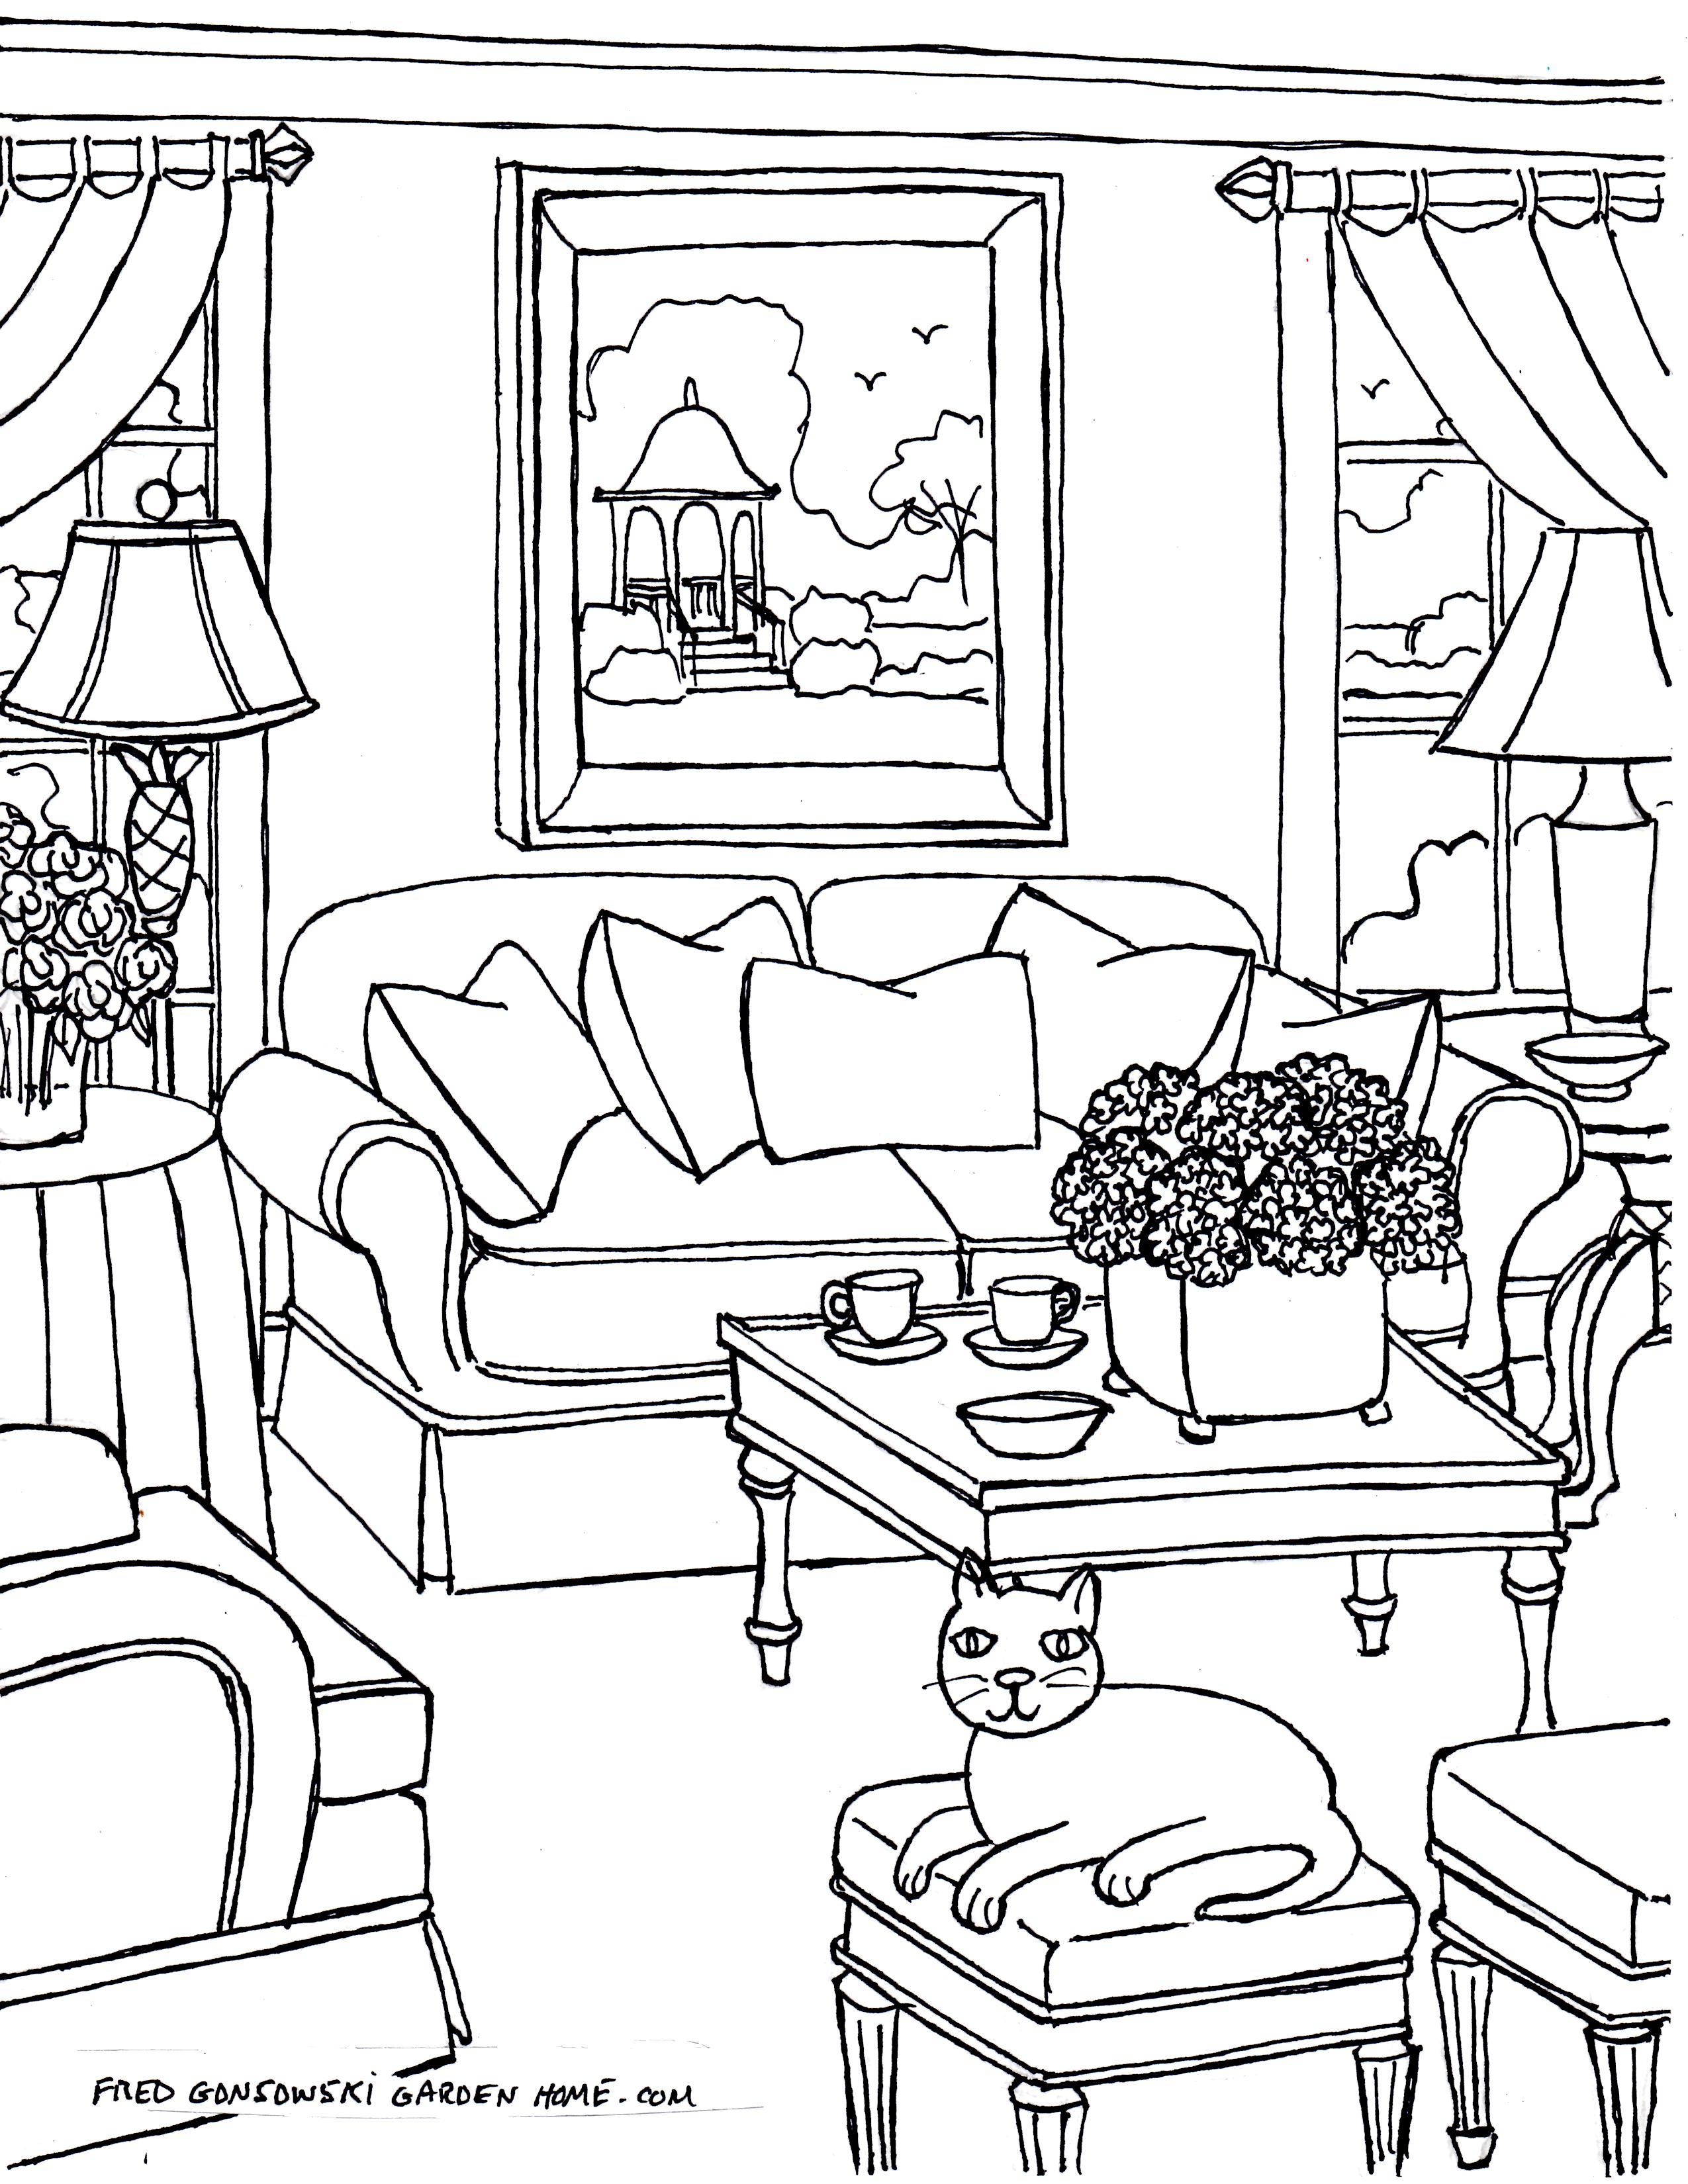 Free Home Drawing At GetDrawings